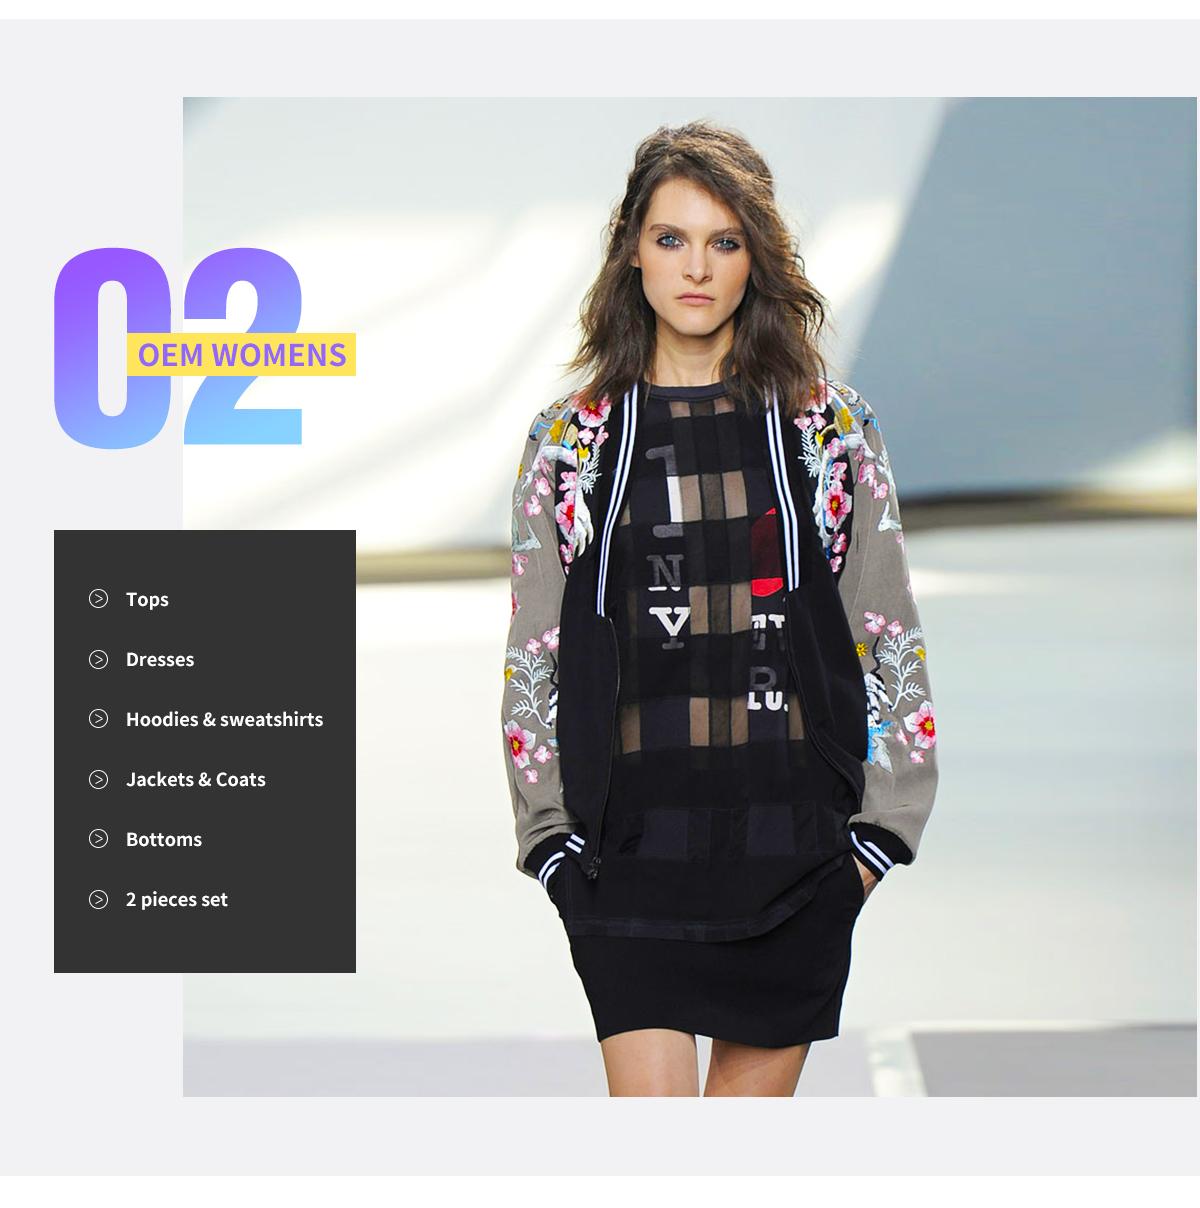 Dongguan City Topshow Garment Co., Ltd. - Hoodies, Tops